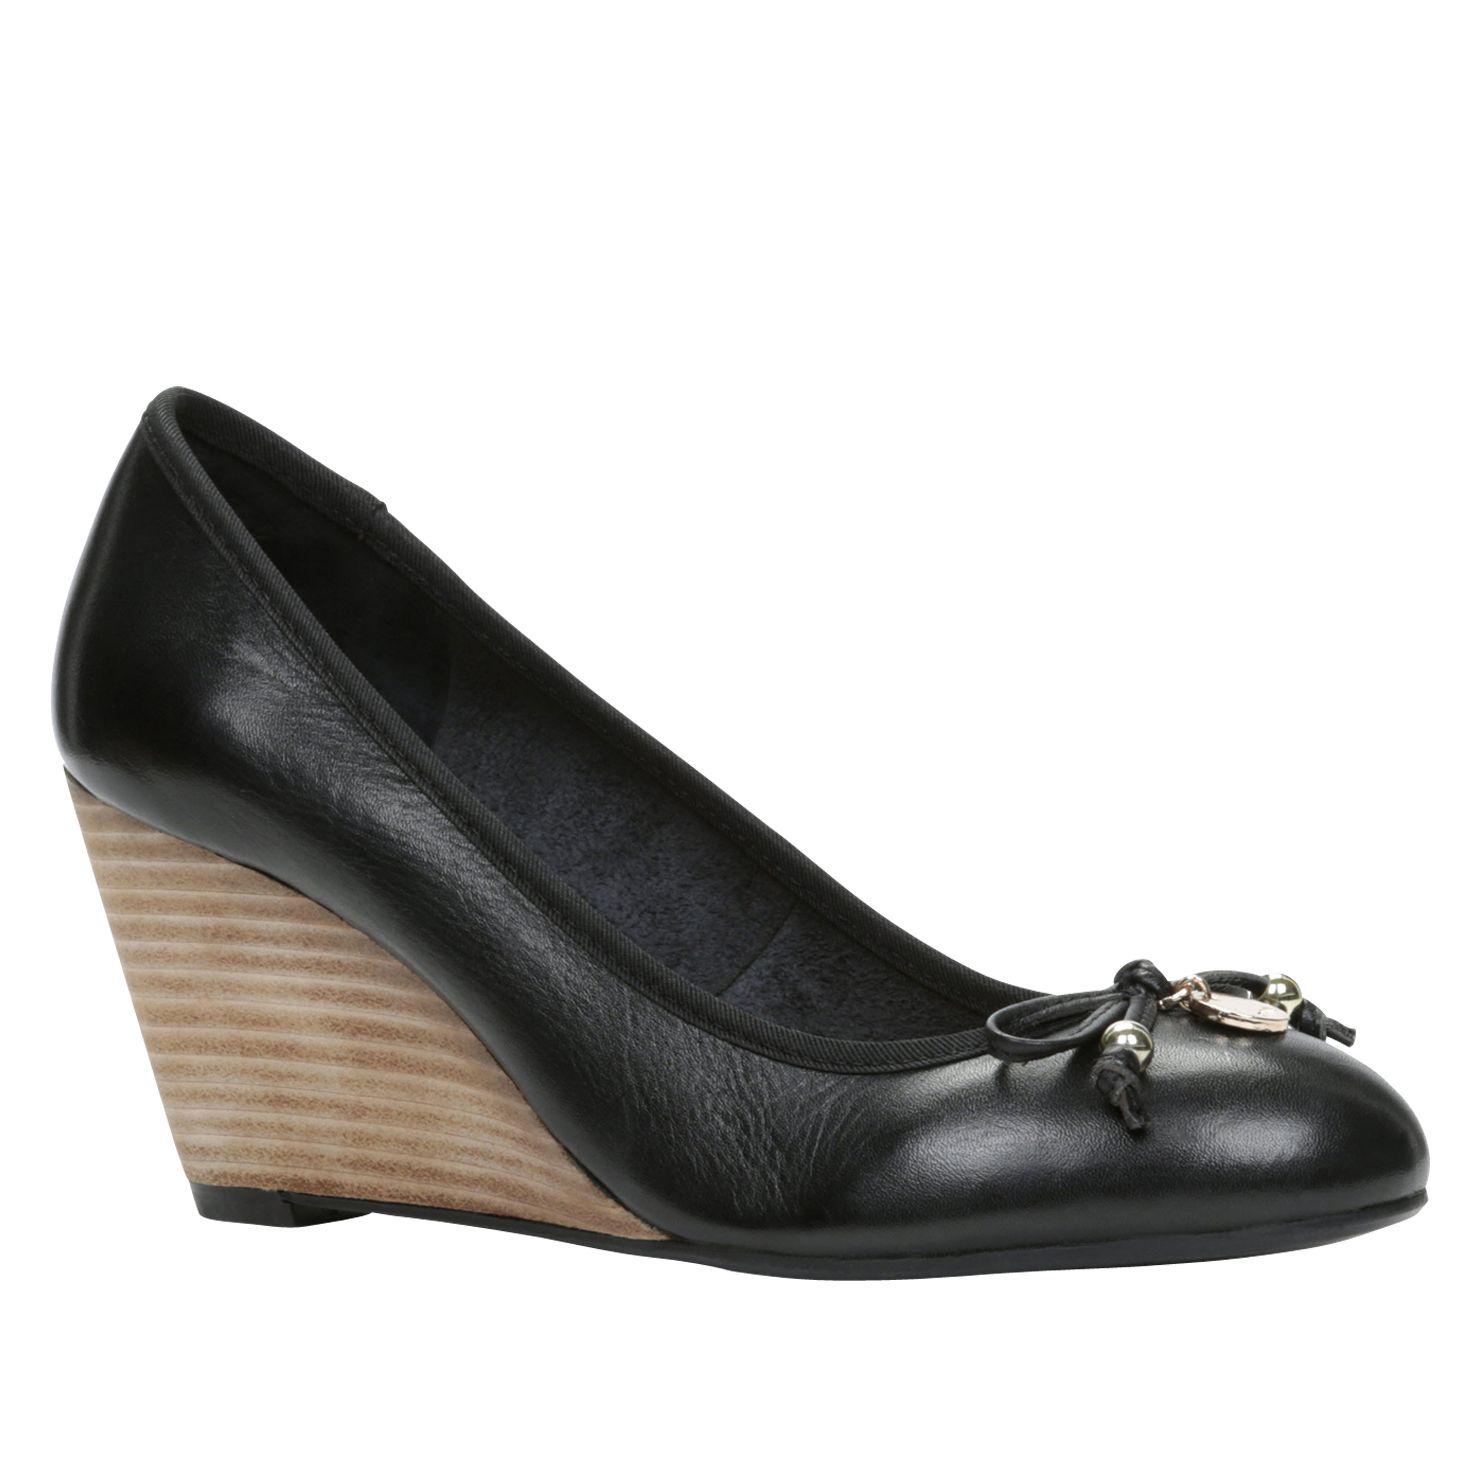 aldo agrarwen toe wedge ballerina shoes in black lyst